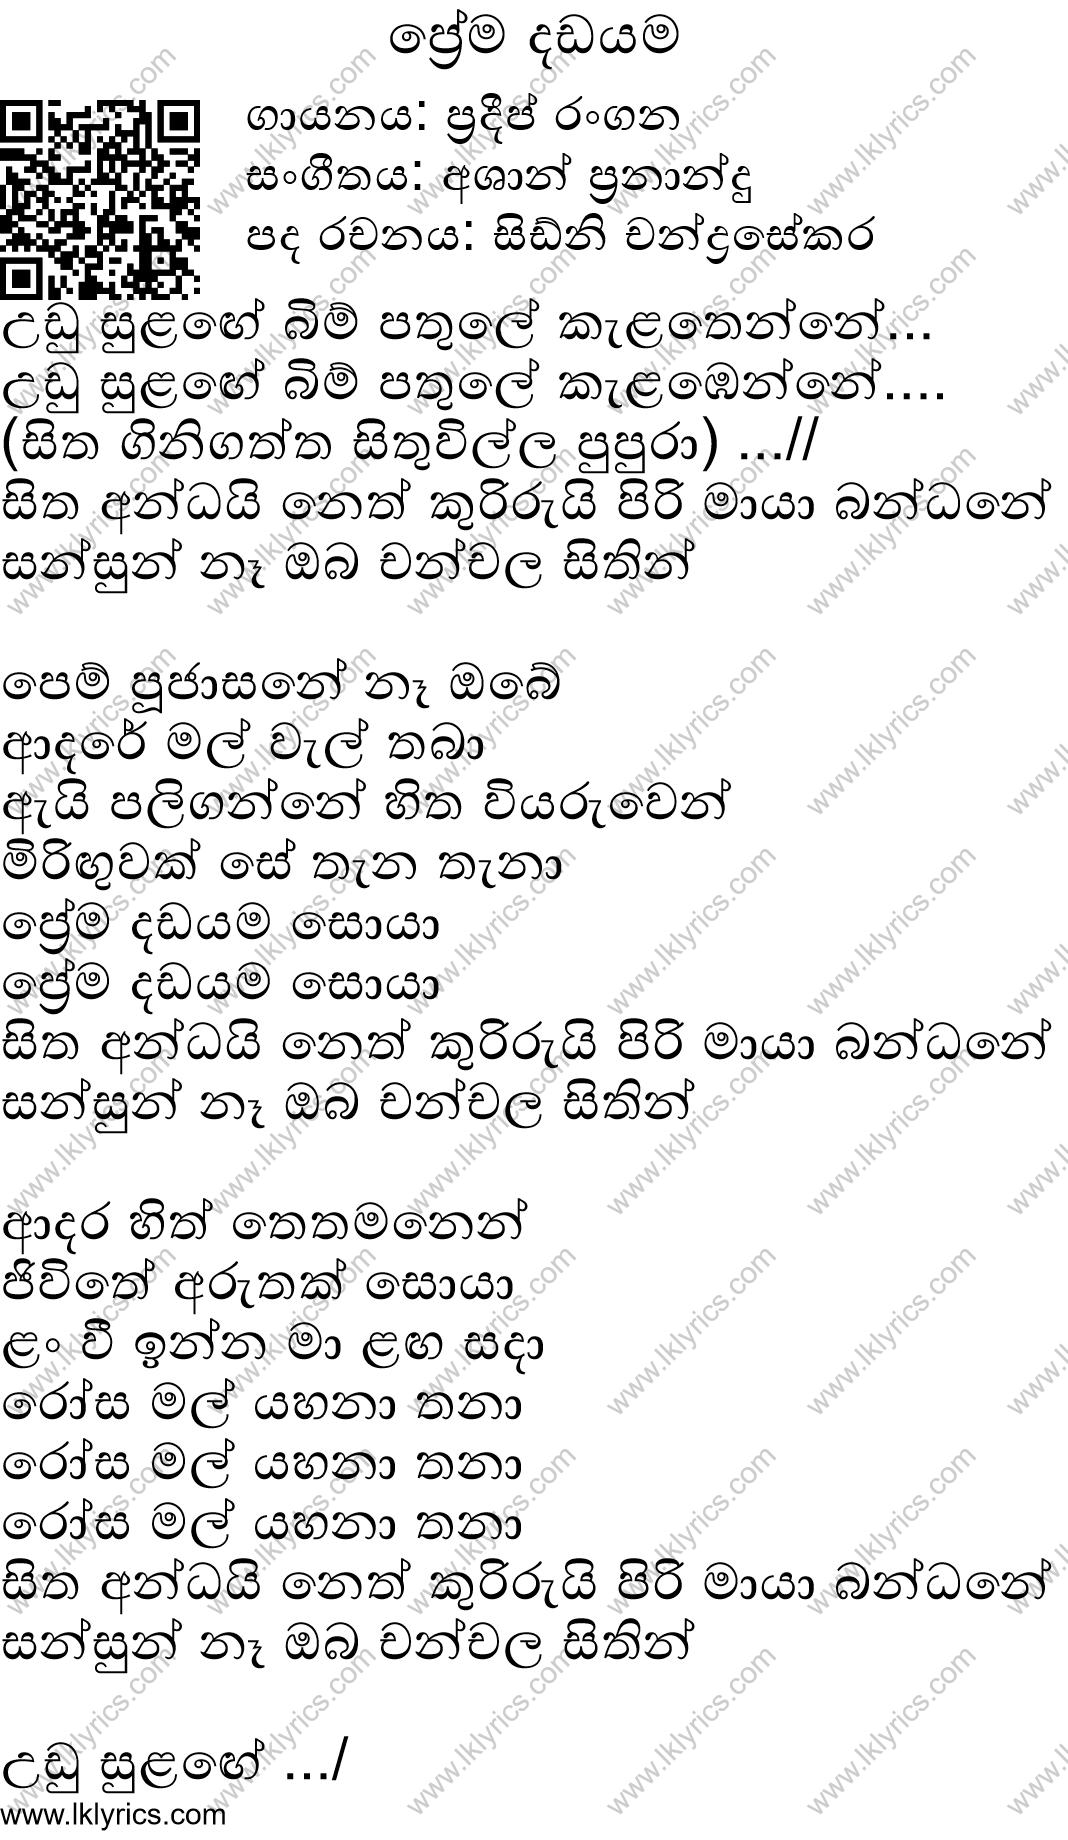 Prema Dadayama Lyrics - LK Lyrics